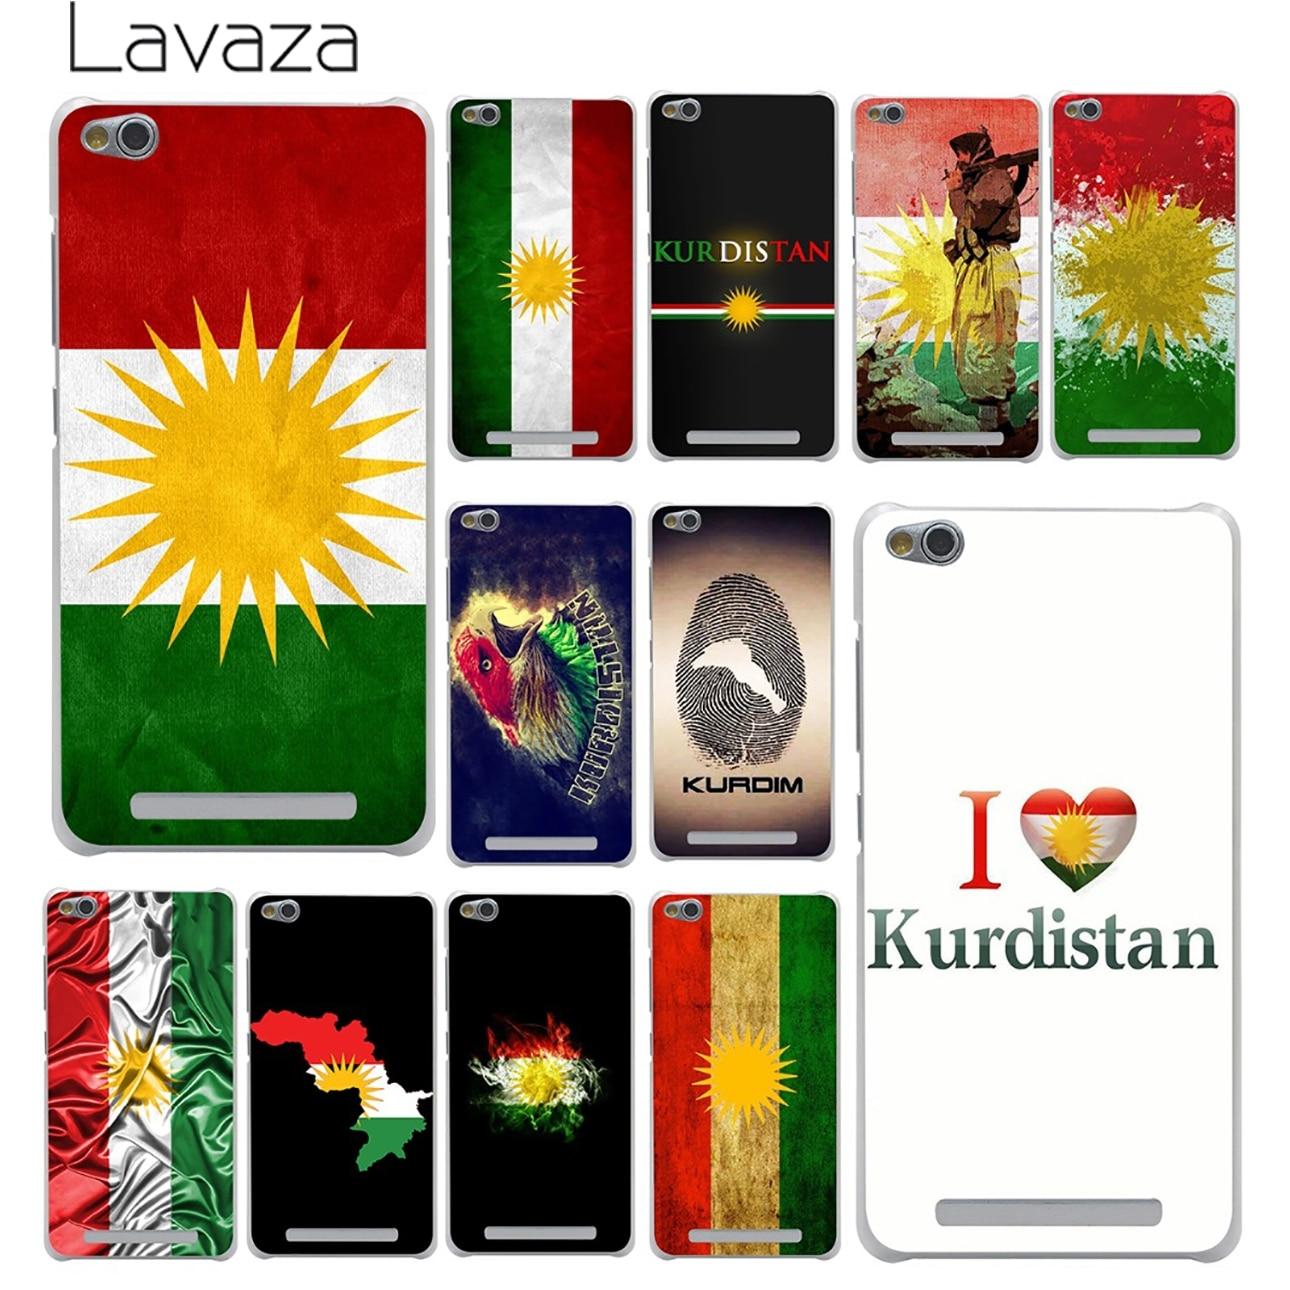 Lavaza Kurdish Autonomous Region flag Case for Xiaomi Redmi 4X Mi A1 6 5 5X 5S Plus Note 5A 4A 2 3 3S 4 4X Pro Prime Mi5X Mi6